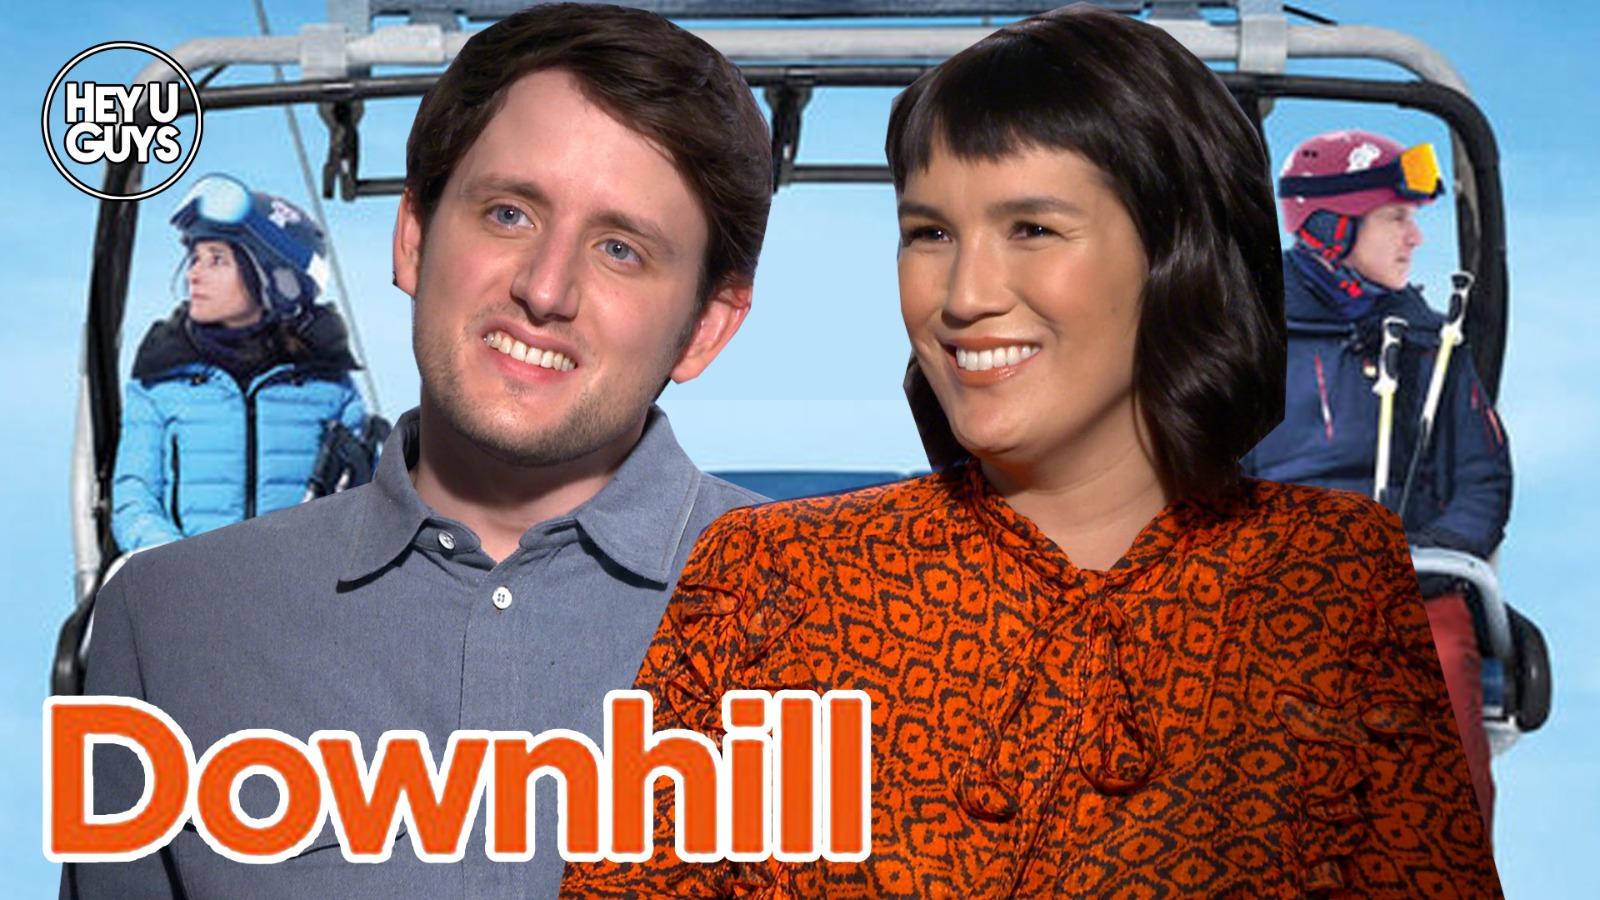 Downhill cast interviews